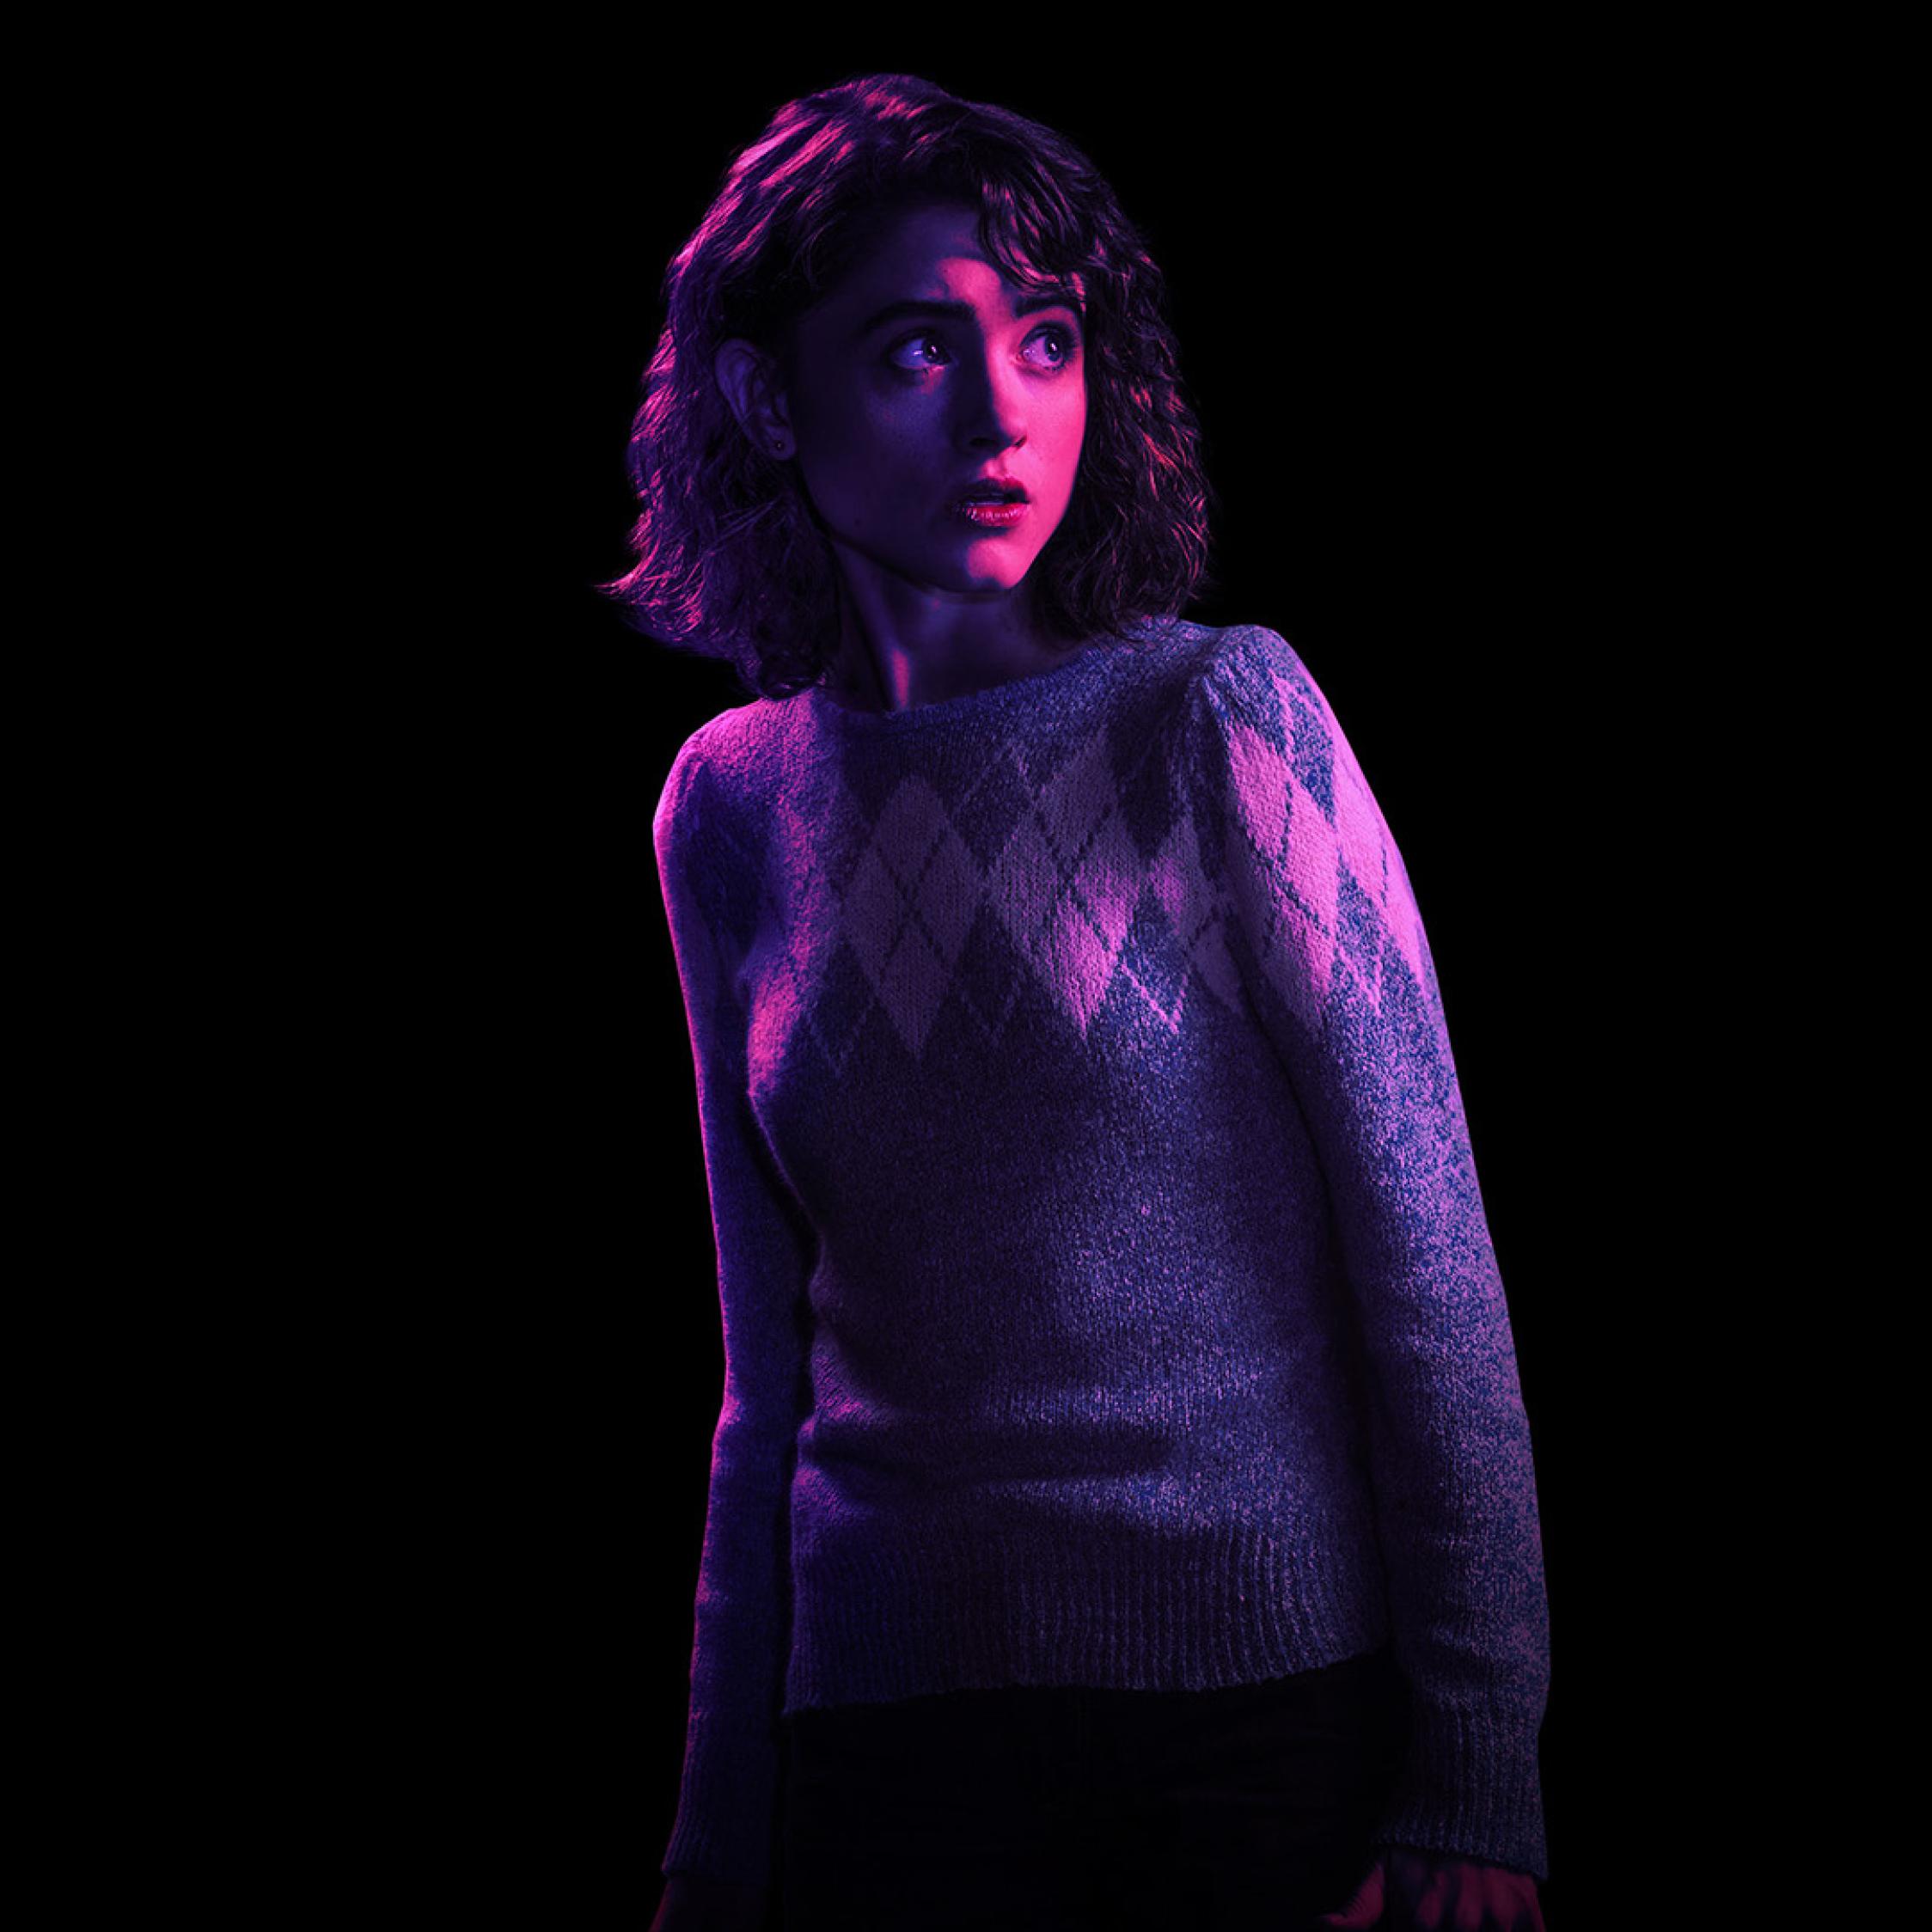 Lucifer Season 3 Hd 4k Wallpaper: Natalia Dyer As Nancy Stranger Things Season 2, Full HD